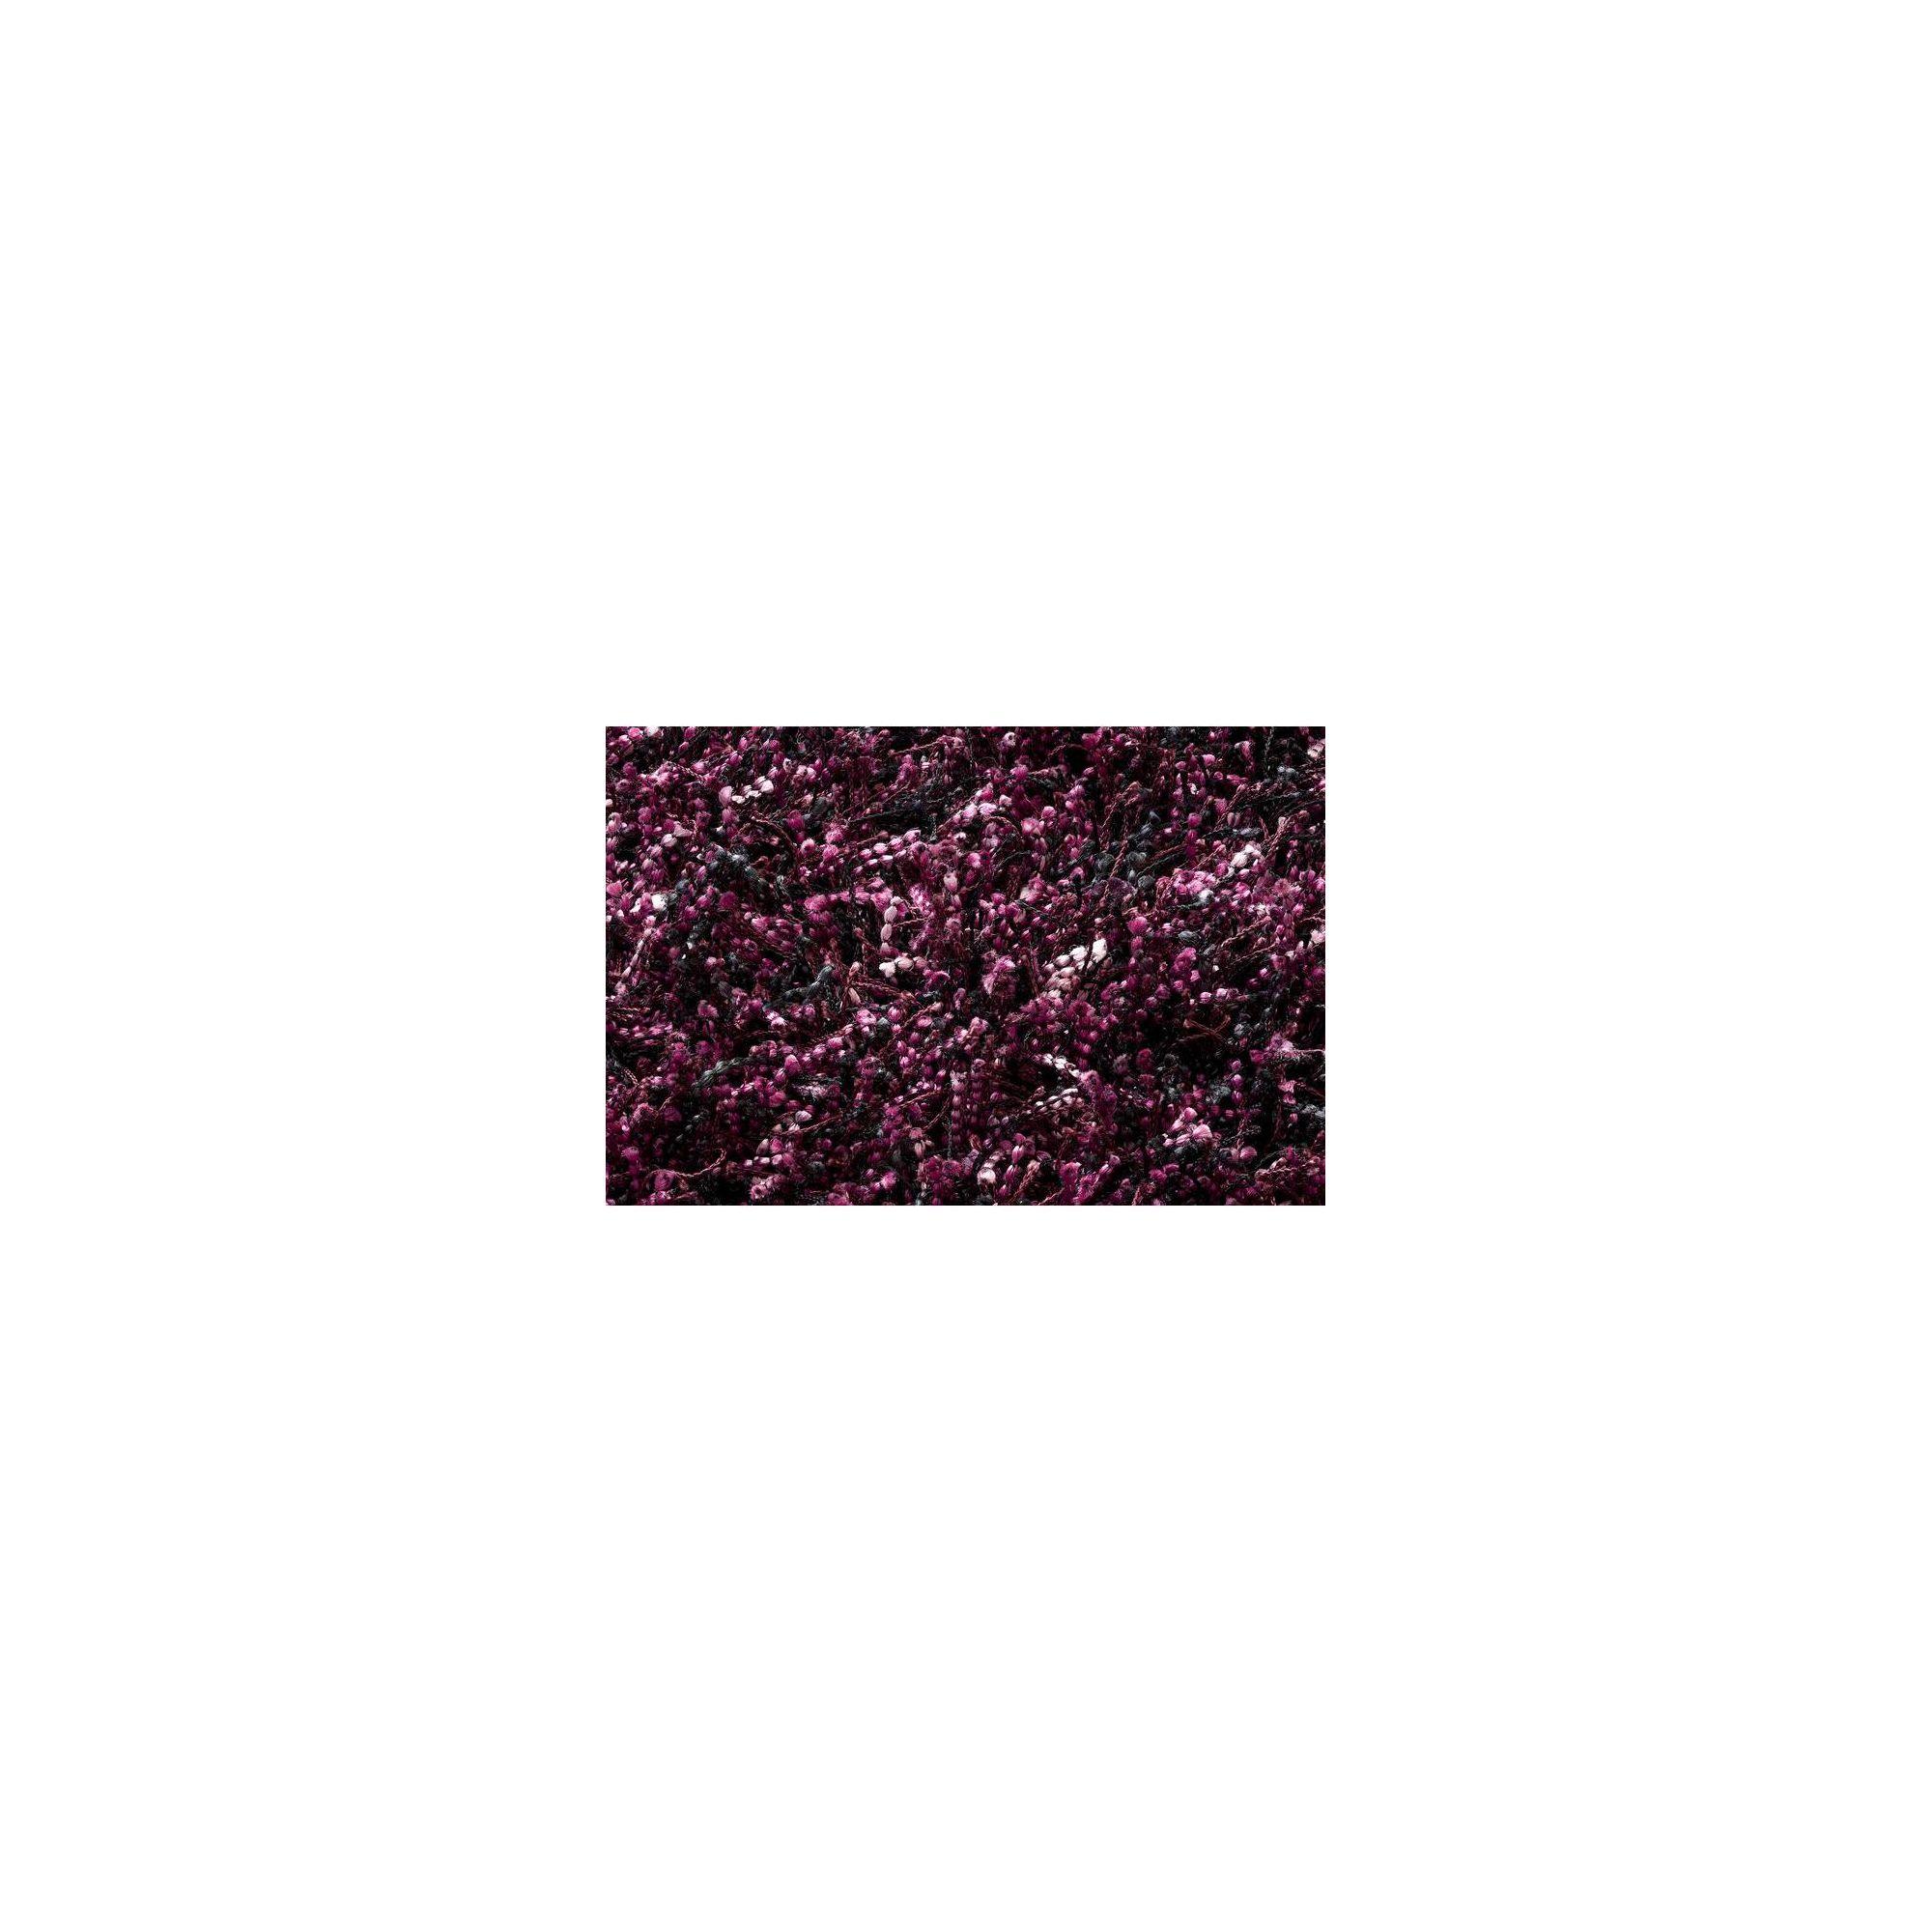 Linie Design Sprinkle Purple Shag Rug - 300cm x 200cm at Tesco Direct